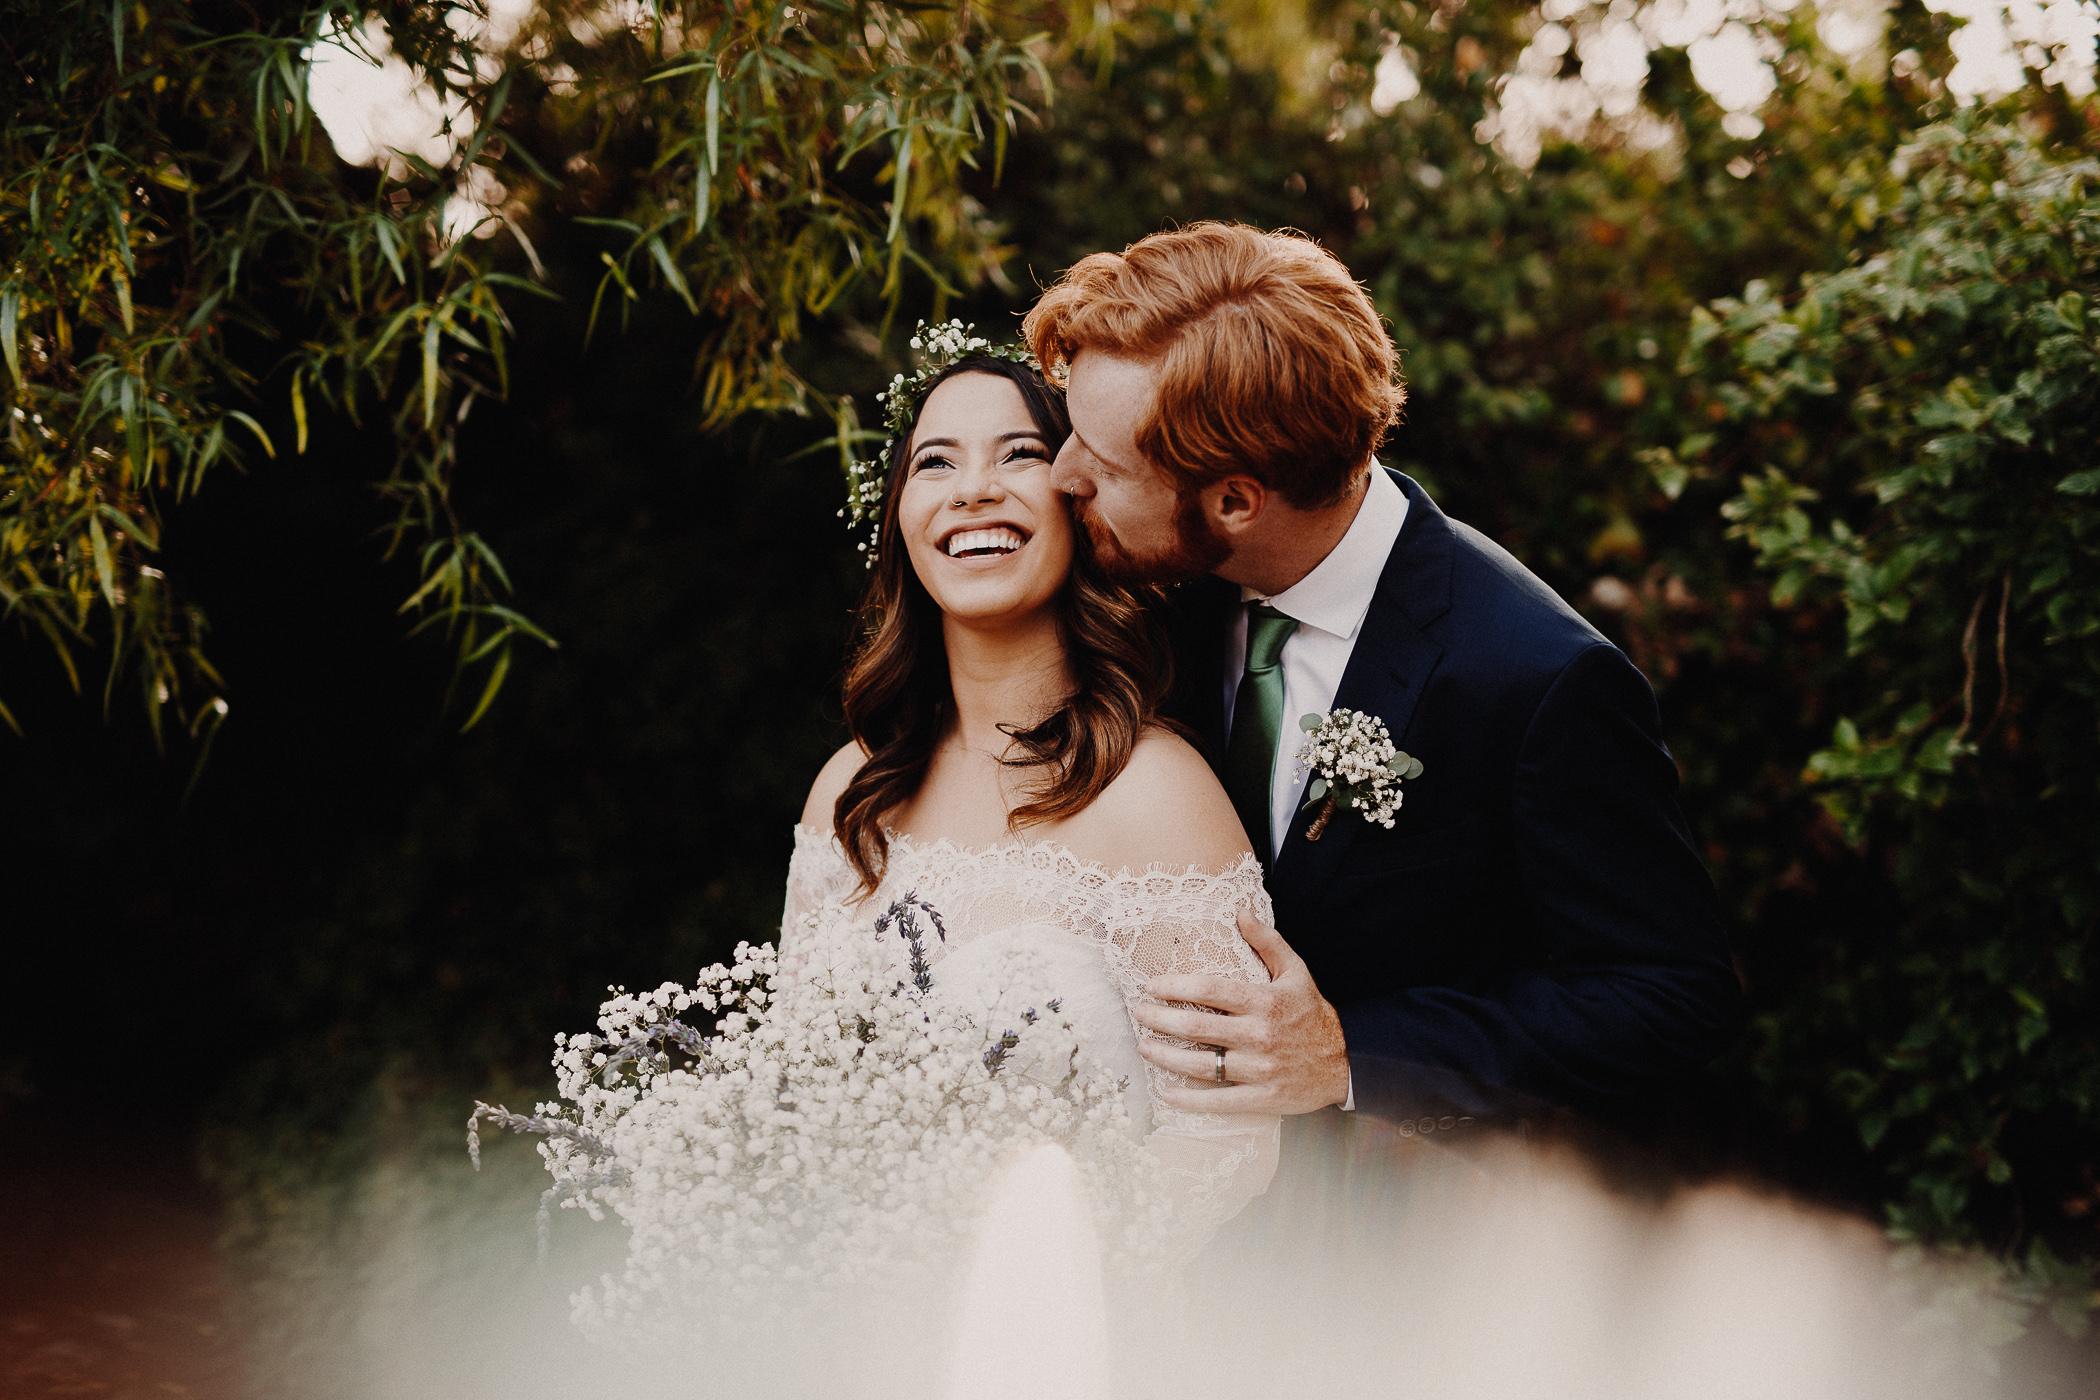 181104-Luxium-Weddings-Arizona-@matt__Le-Brandon-Kariana-Phoenix-Valley-Garden-Center-1081.jpg